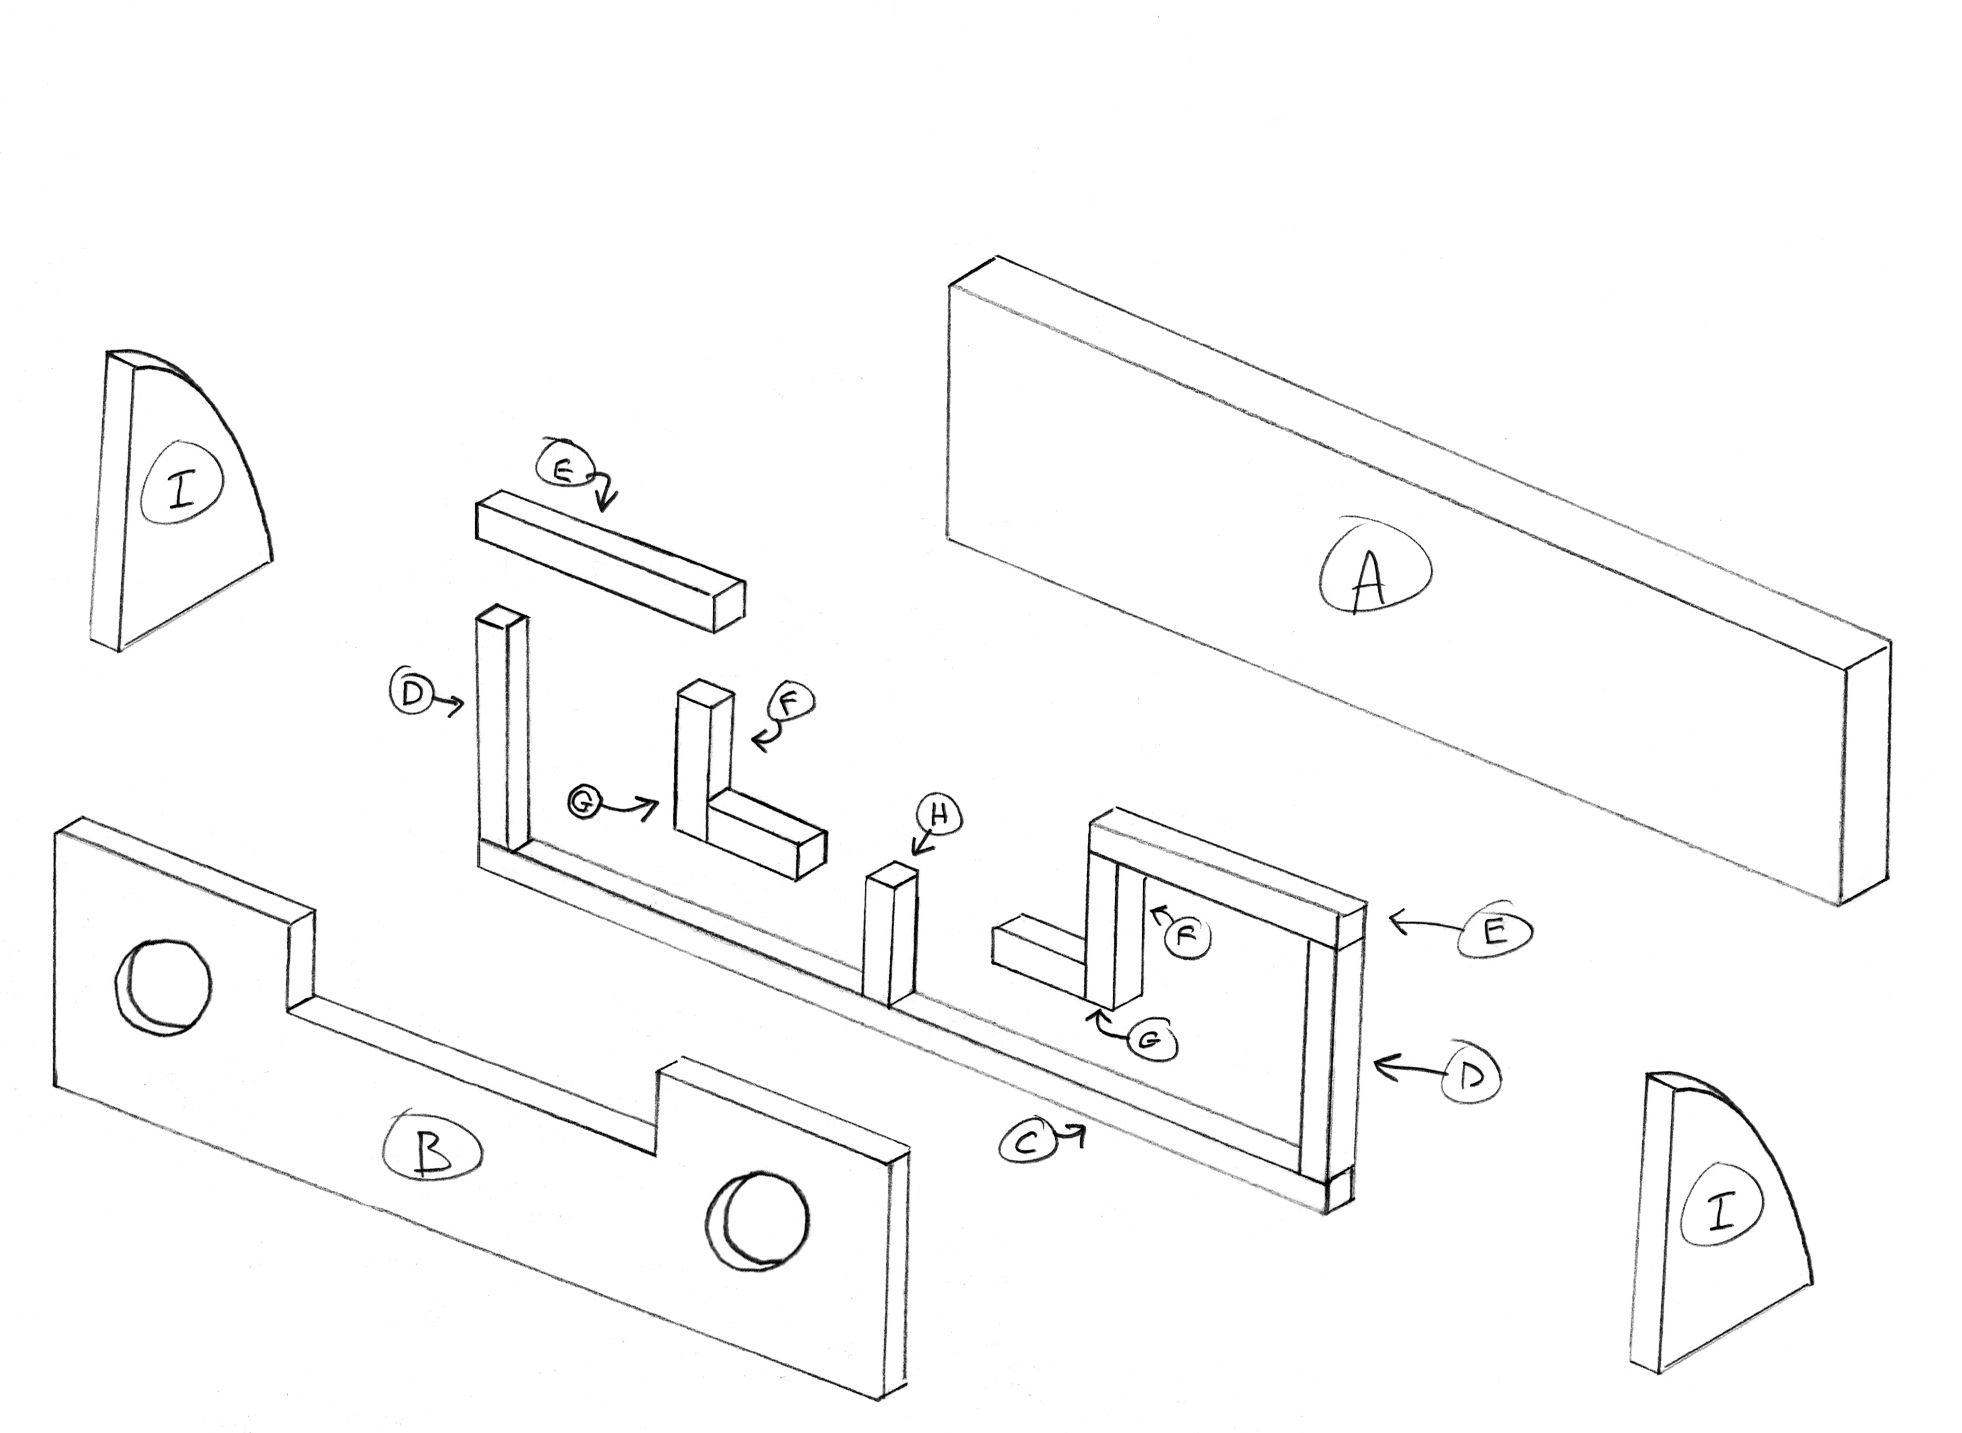 Build A Wooden Passive Speaker For Smart Phone Or Tablet